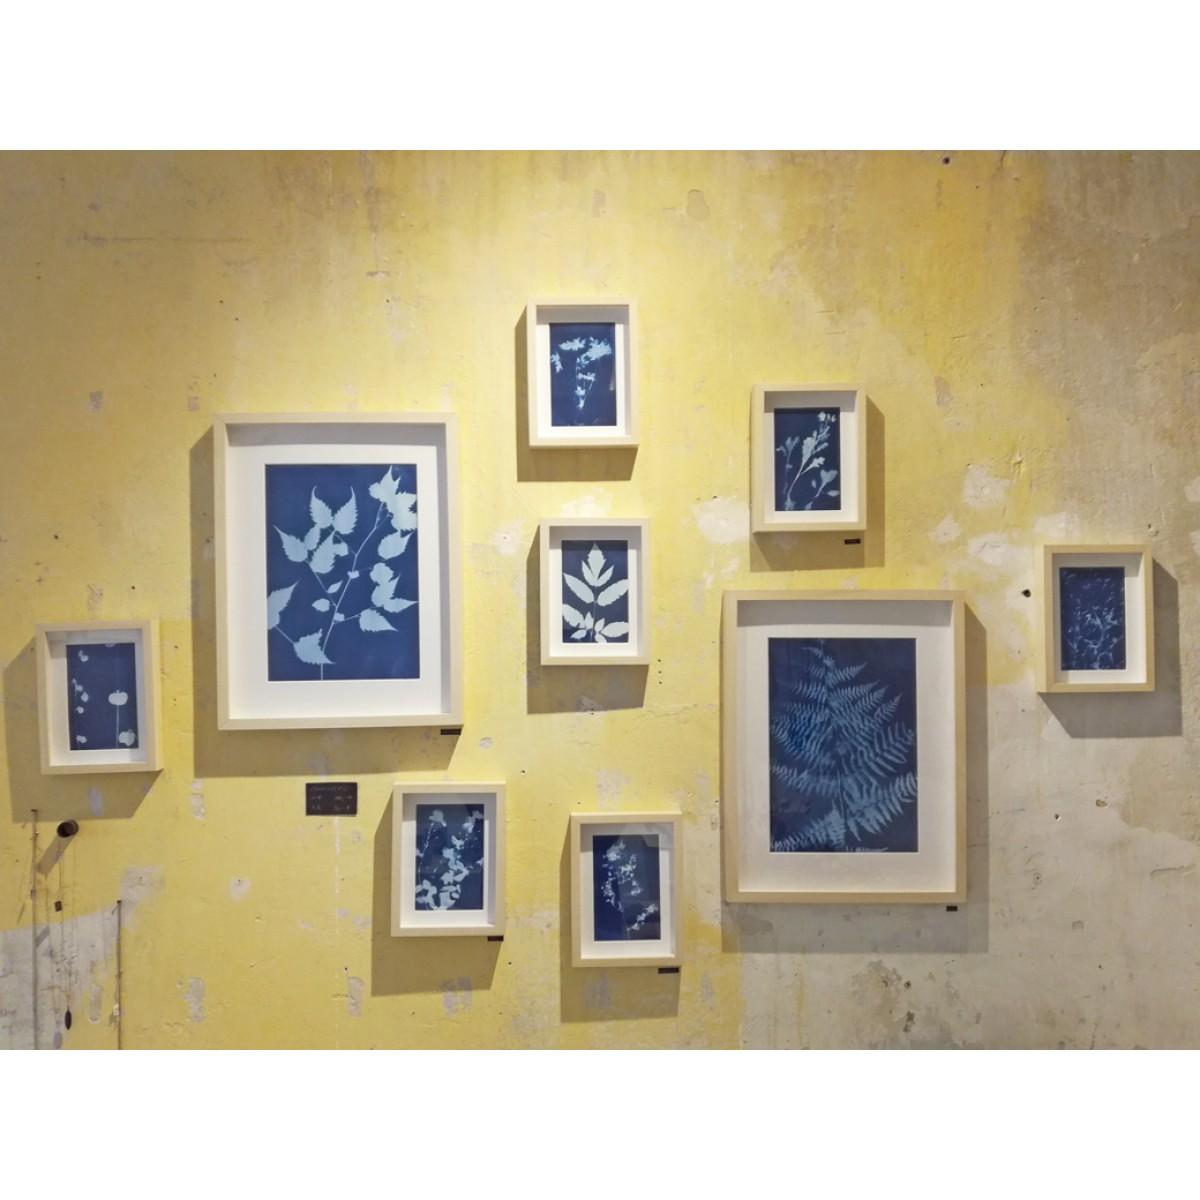 Anka Büchler, Knöterich, Blaudruck,Cyanotypie, Unikat, A6, gerahmt, Motiv 5